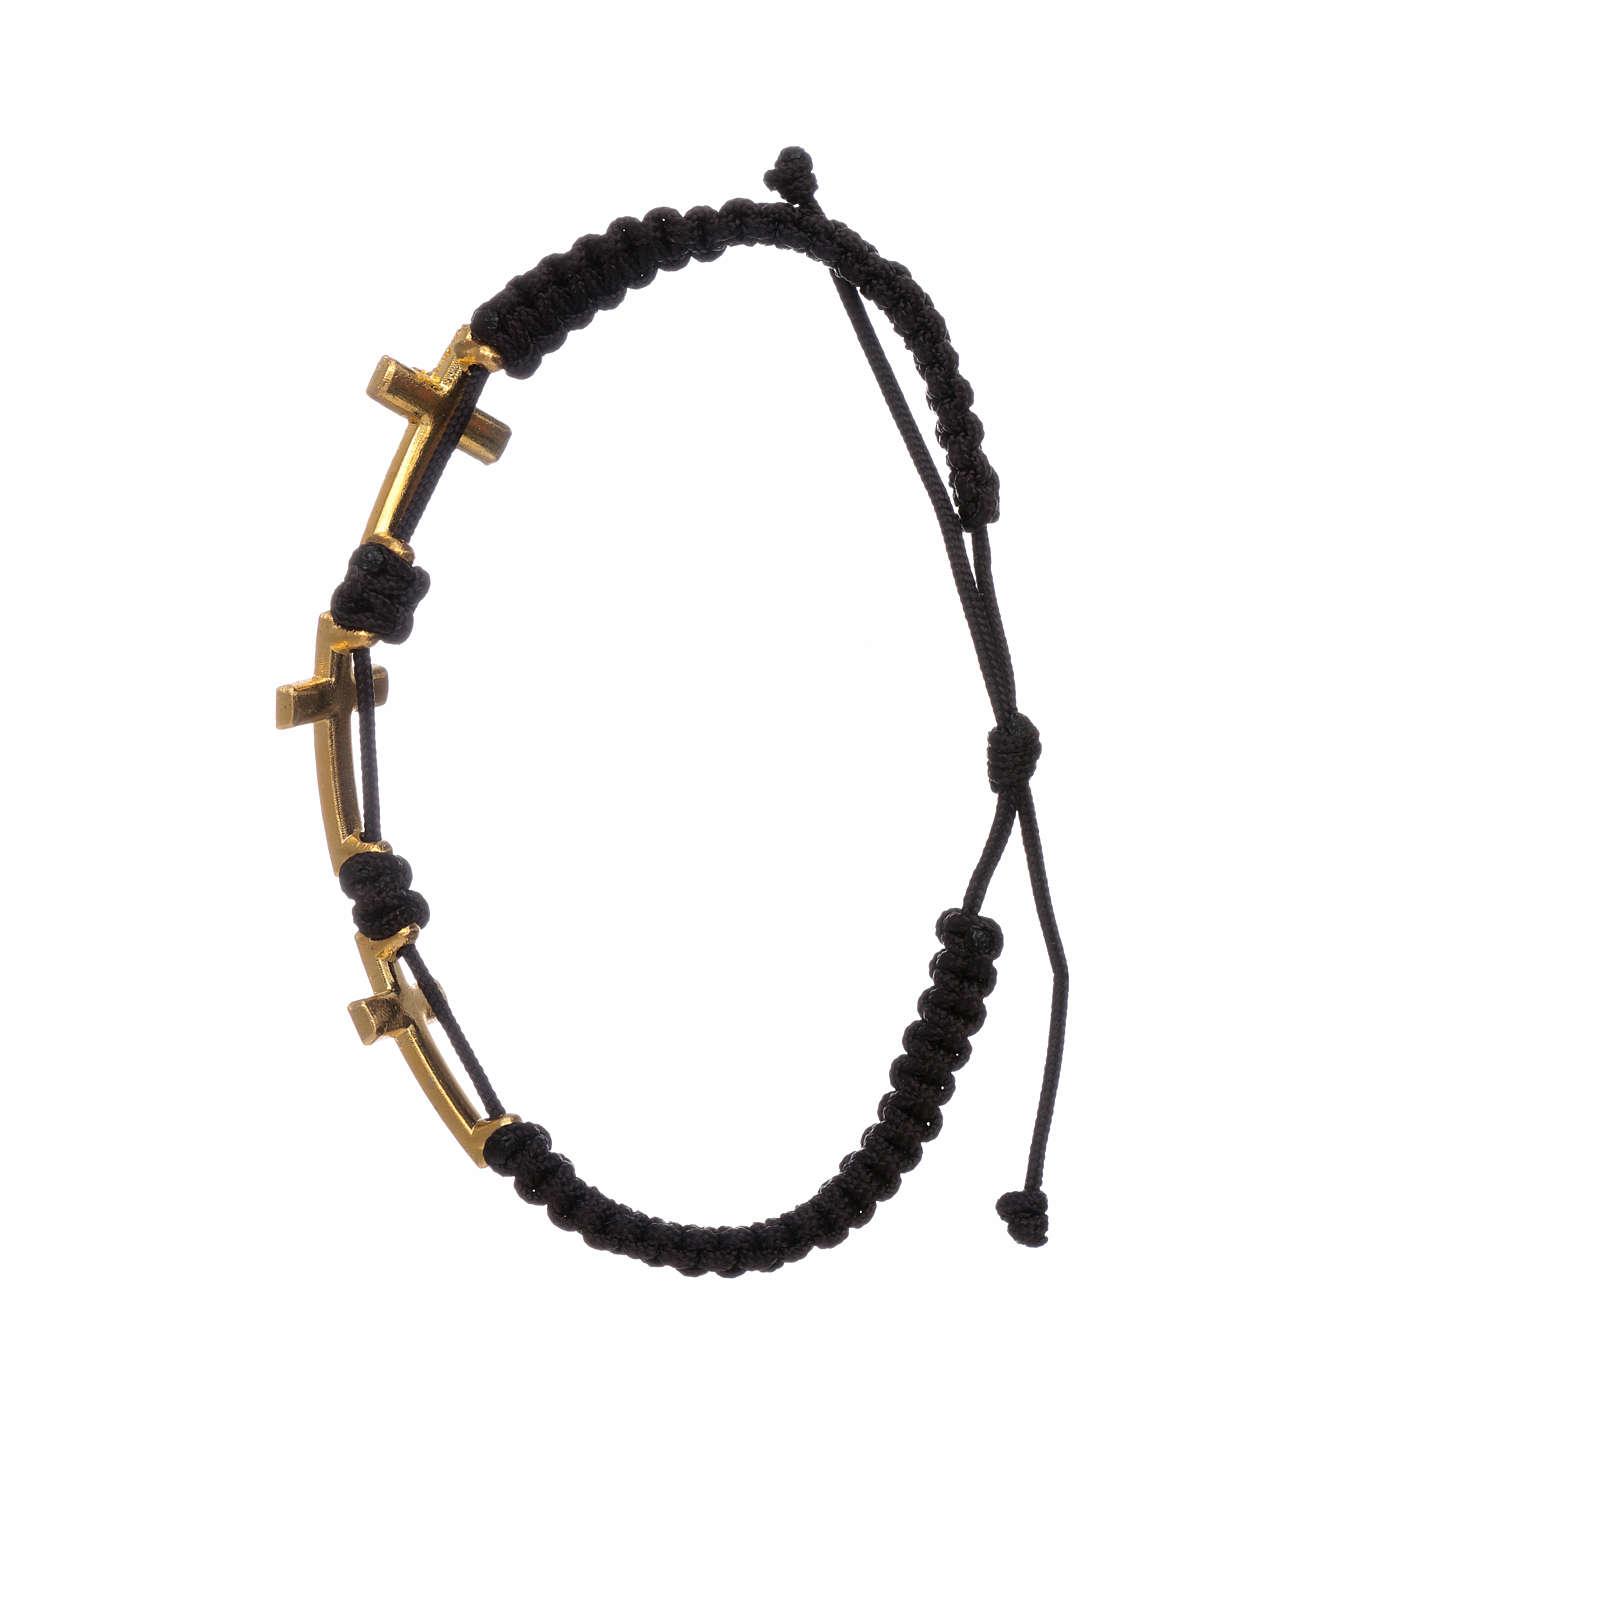 Bracciale Medjugorje 3 croci corda nera e Swarovski 4